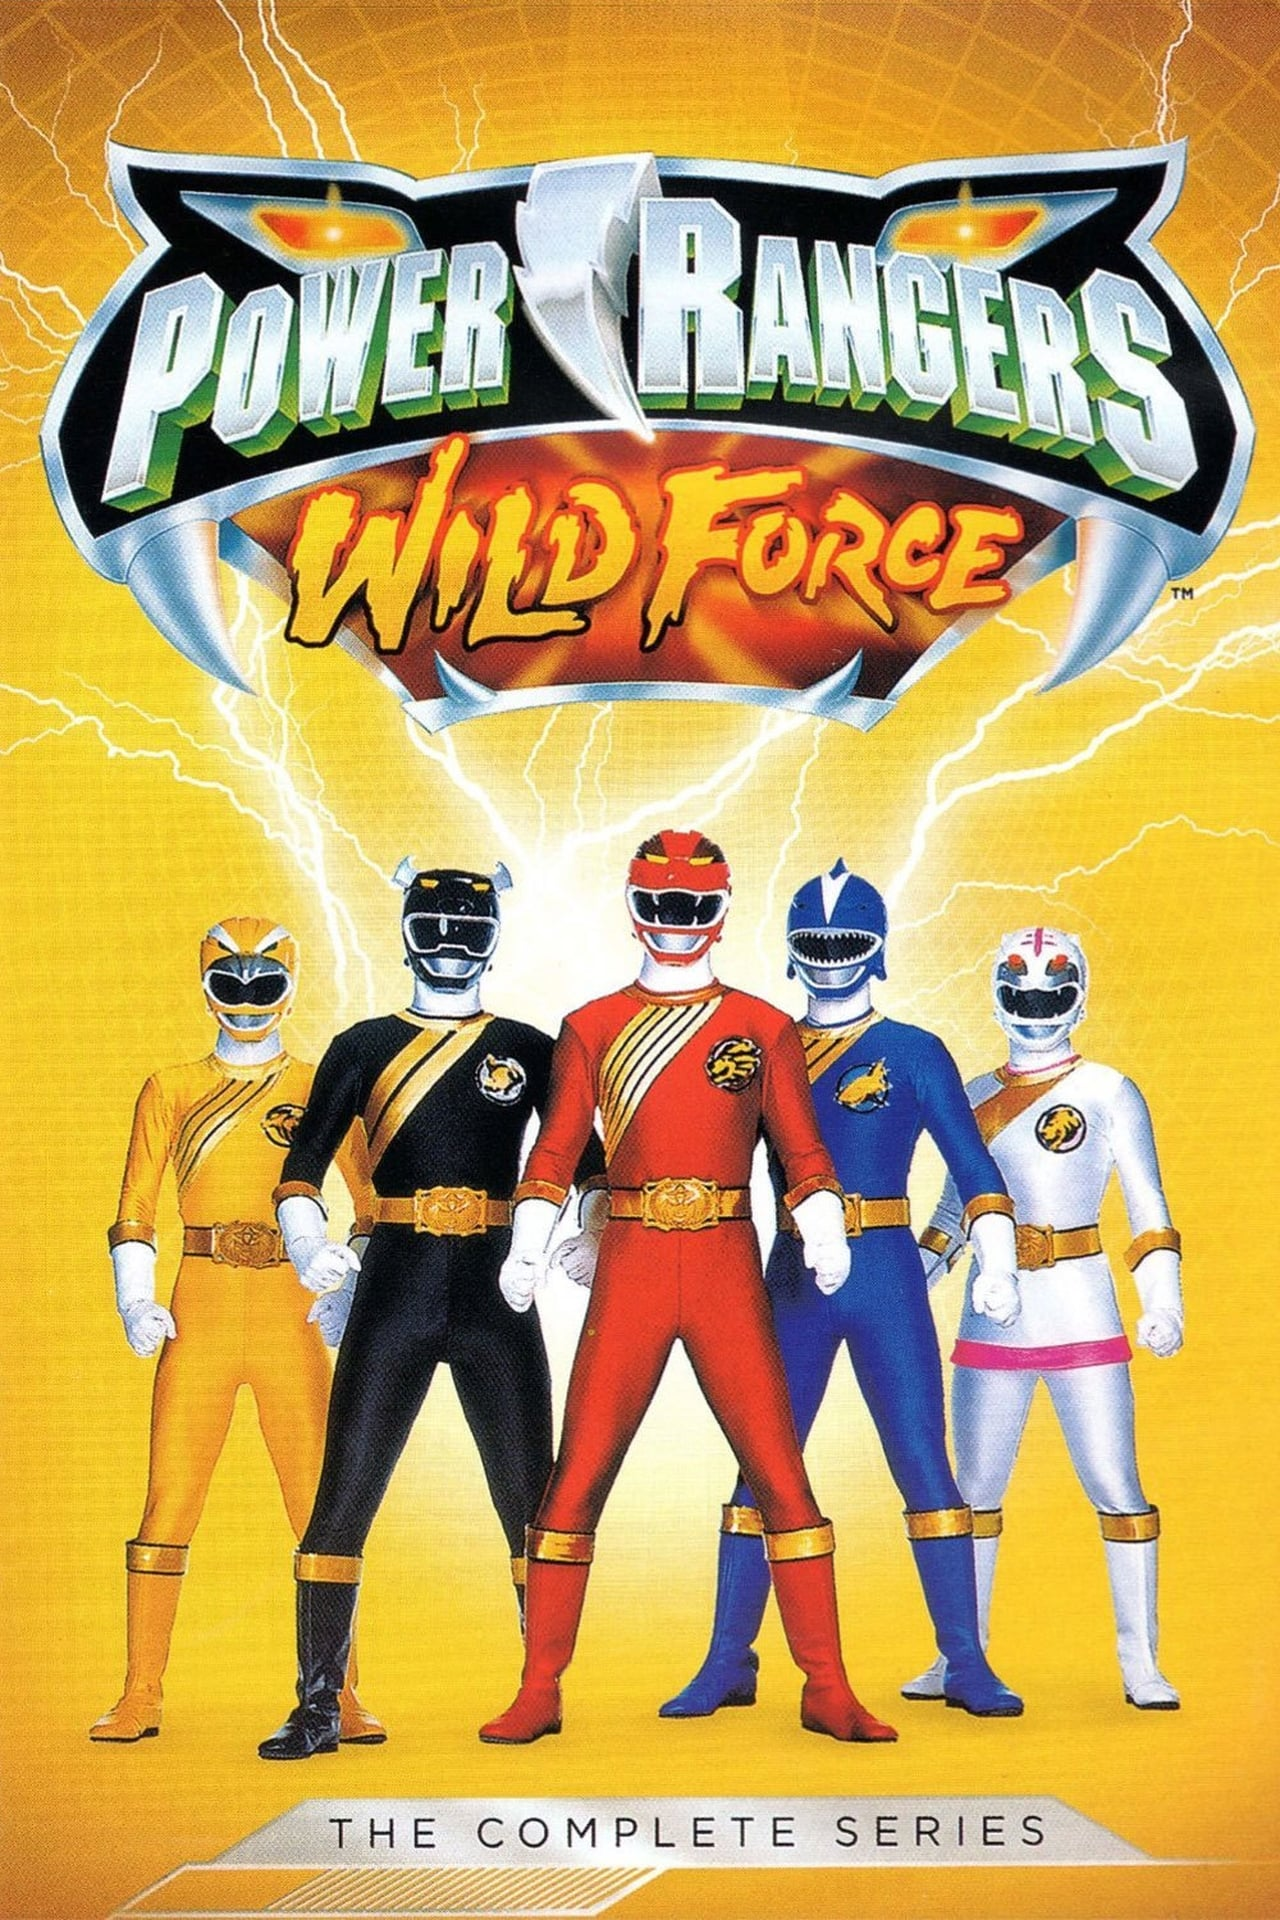 Power Rangers Season 10 (2003) putlockers cafe